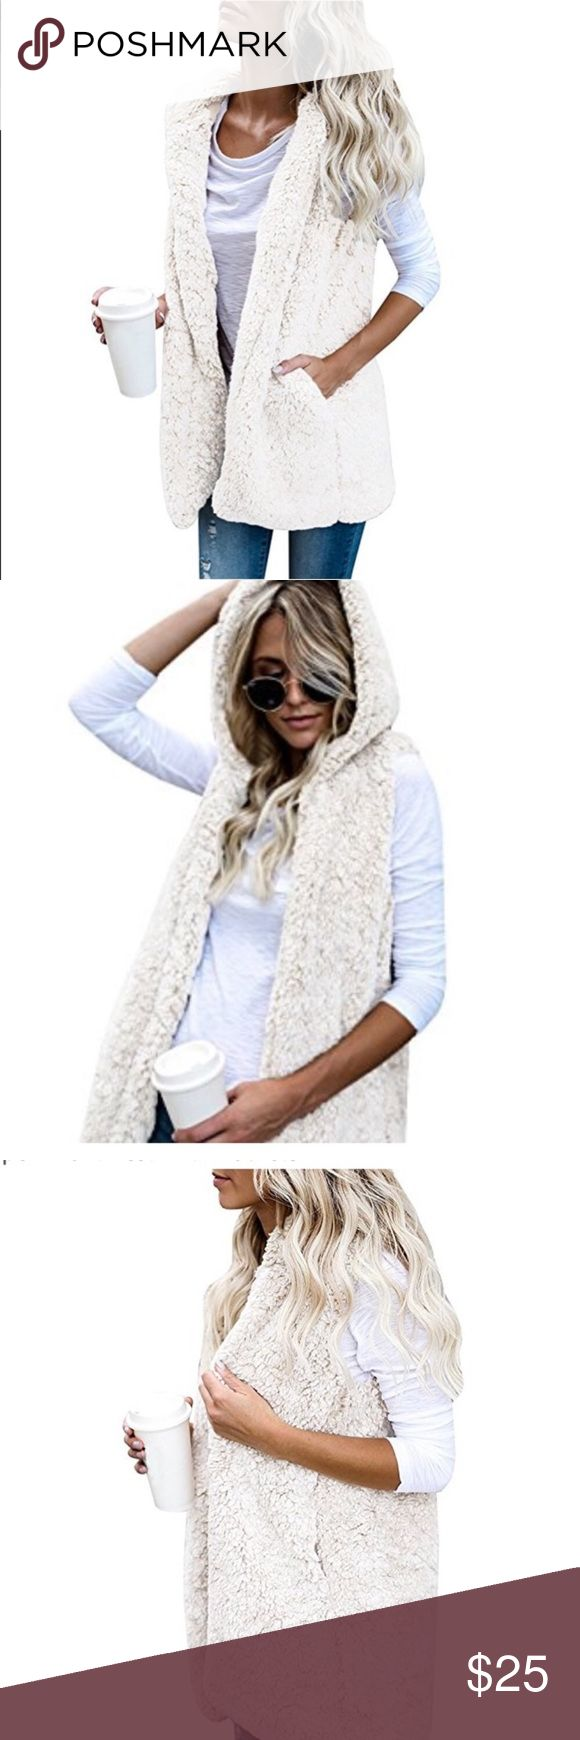 Women's sleeveless fuzzy Vest! Women's fuzzy sleeveless Cardigan Hoodie Sherpa Fleece! Open Front Vest with Pockets! Jackets & Coats Vests